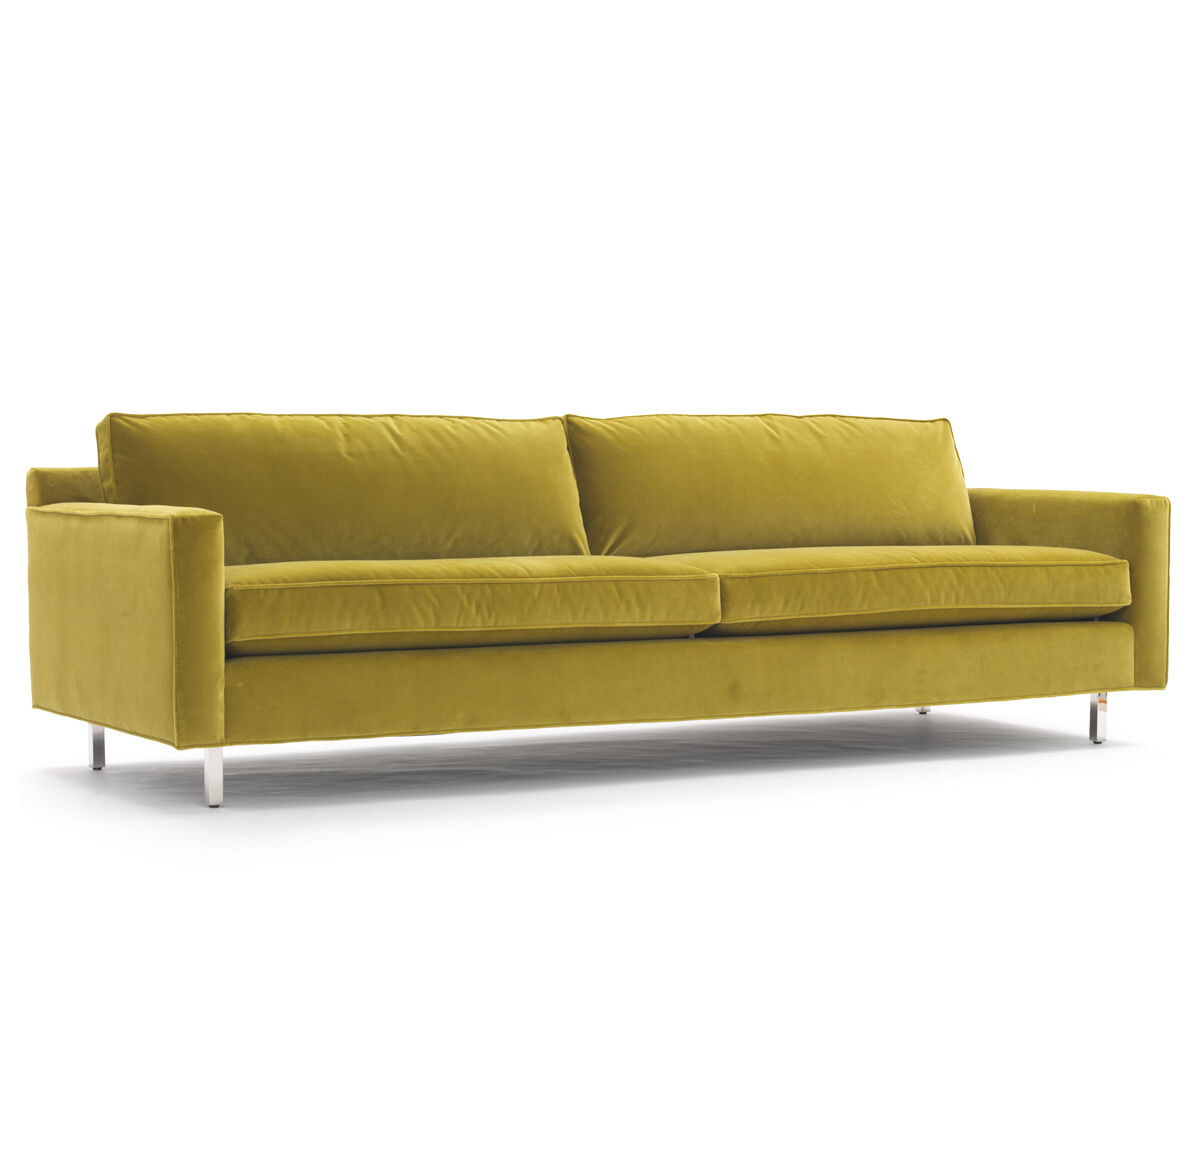 mitc gold hunter sofa flexsteel motorhome sofas